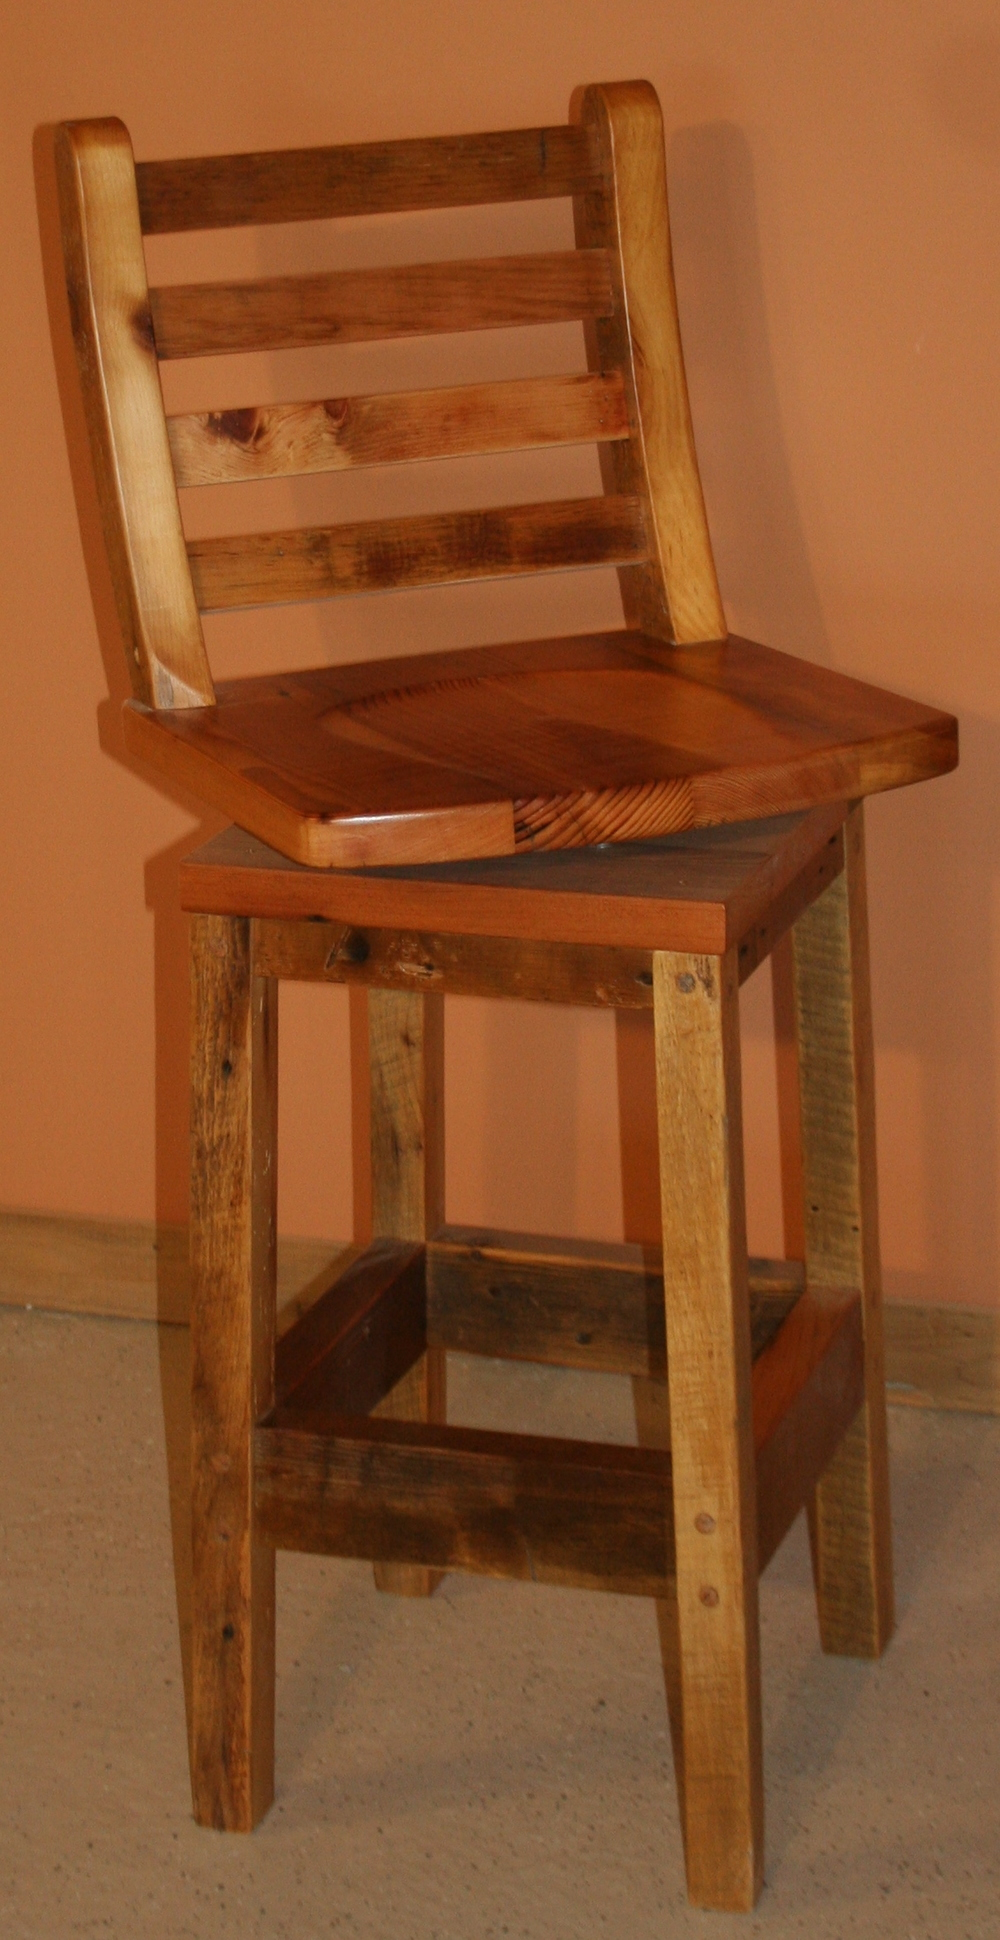 rustic restaurant bar stools rustic restaurant furniture rustic hospitality furniture and. Black Bedroom Furniture Sets. Home Design Ideas